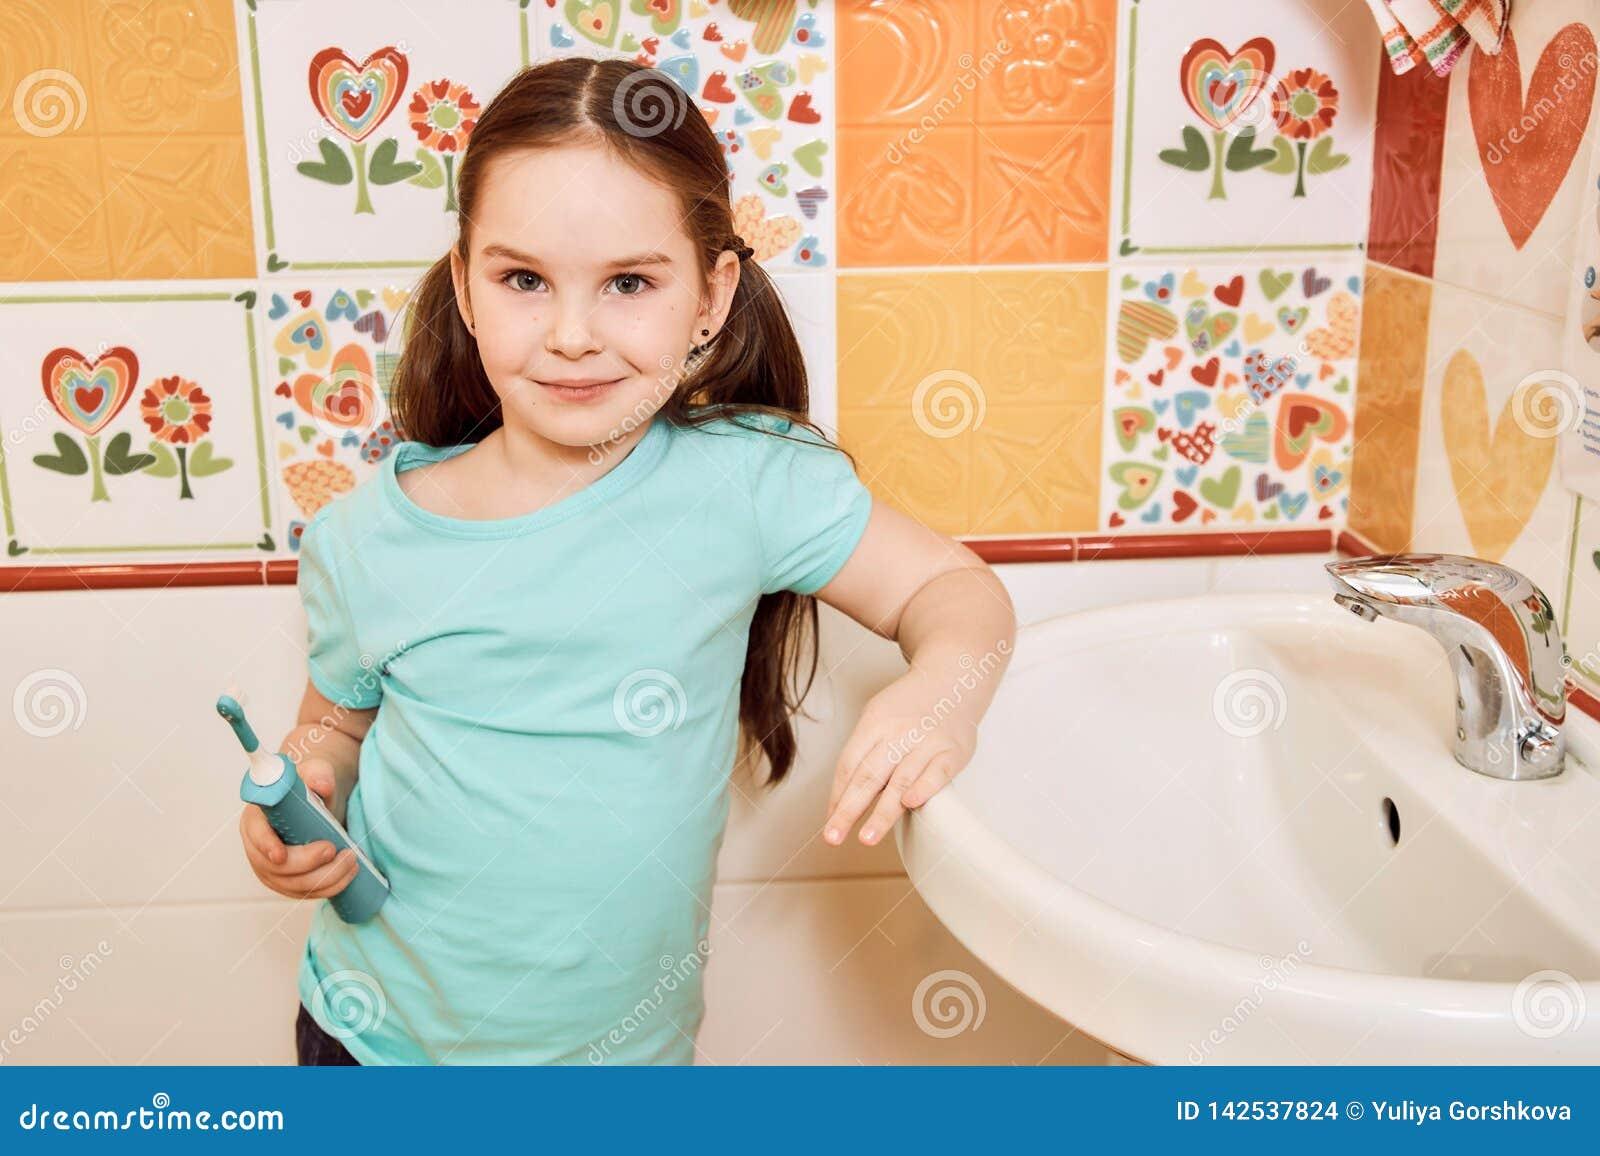 Little girl brushing her teeth in the bathroom